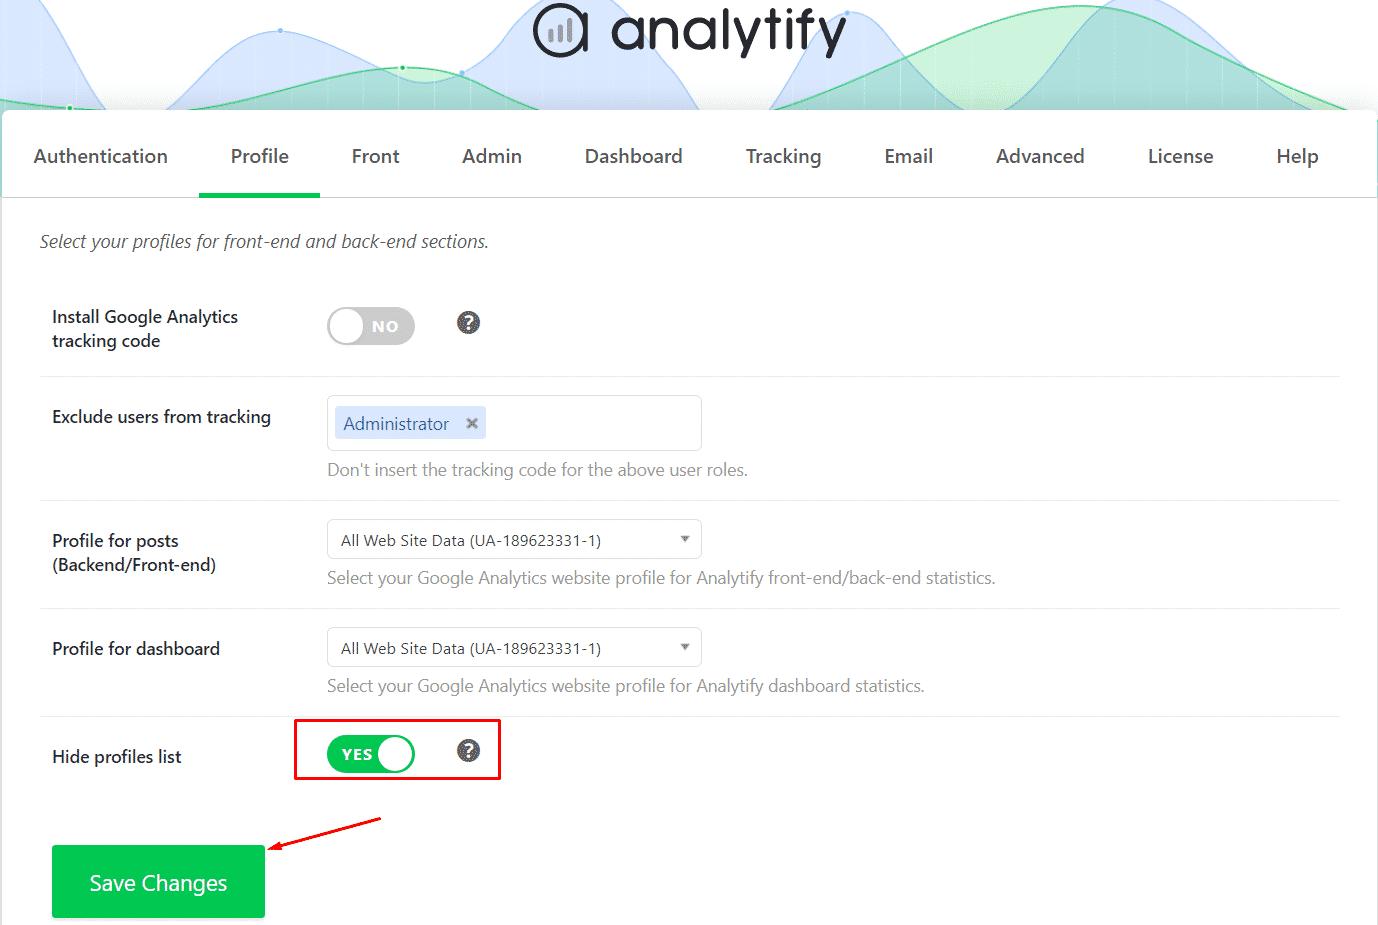 Enable Hide profiles list